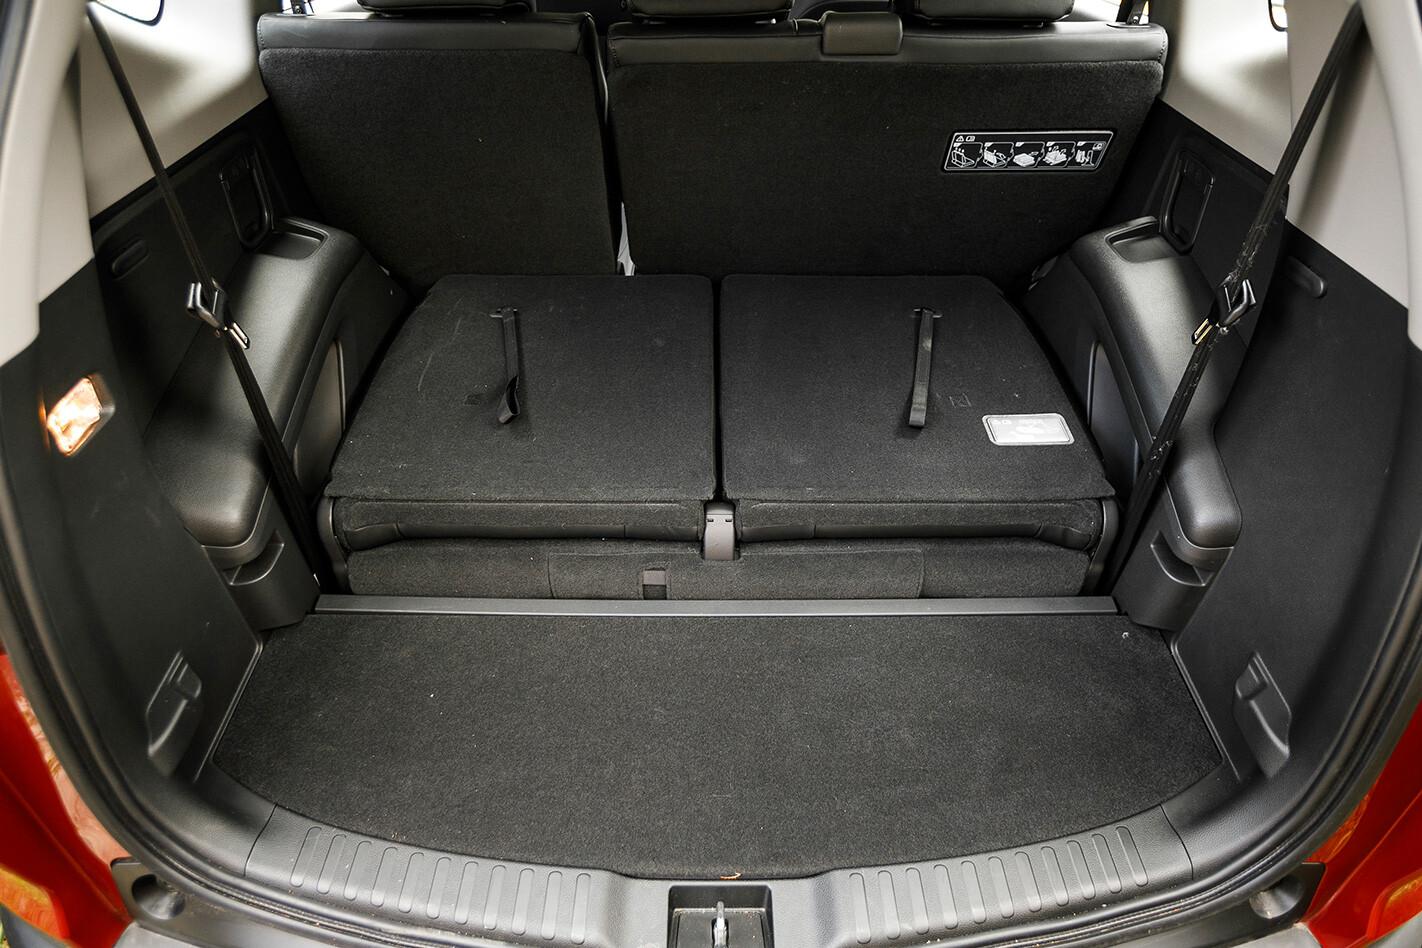 Honda CR V VTi L boot